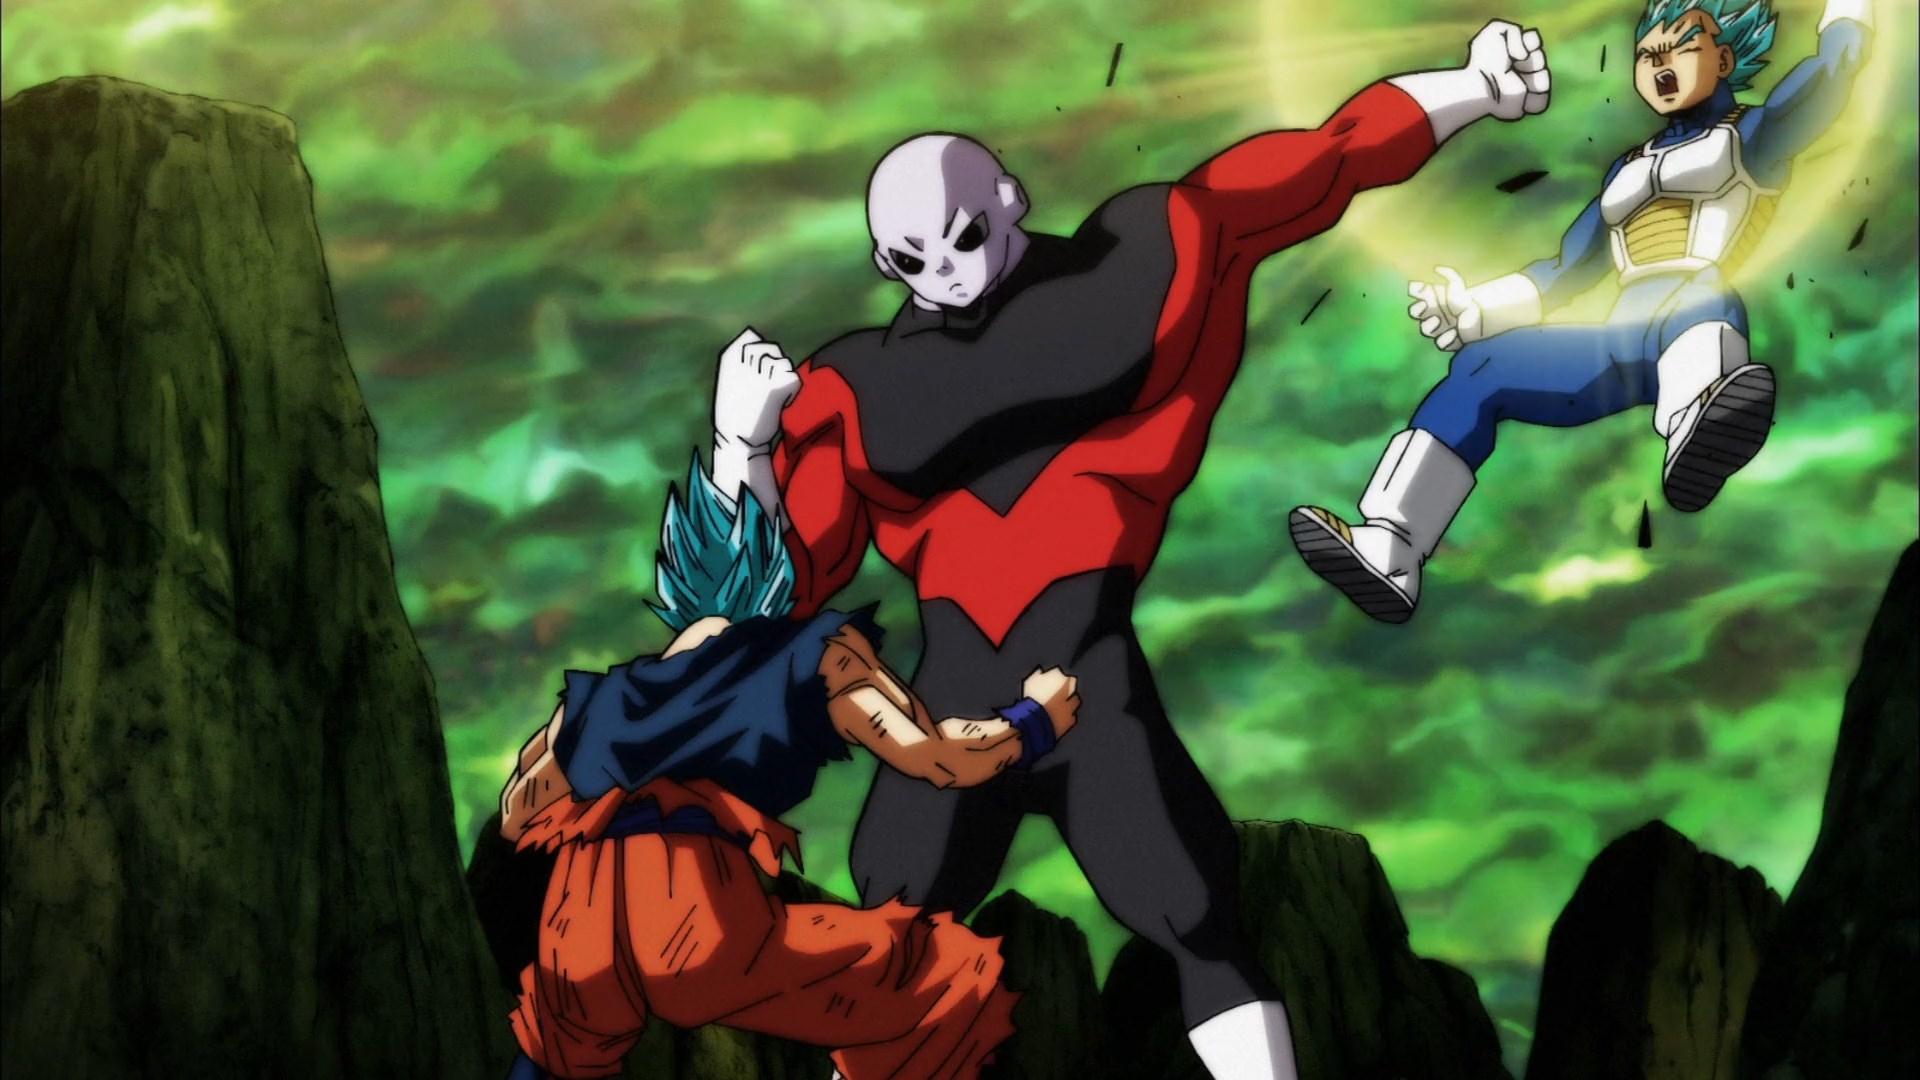 [HorribleSubs] Dragon Ball Super - 121 [1080p].mkv_snapshot_23.09